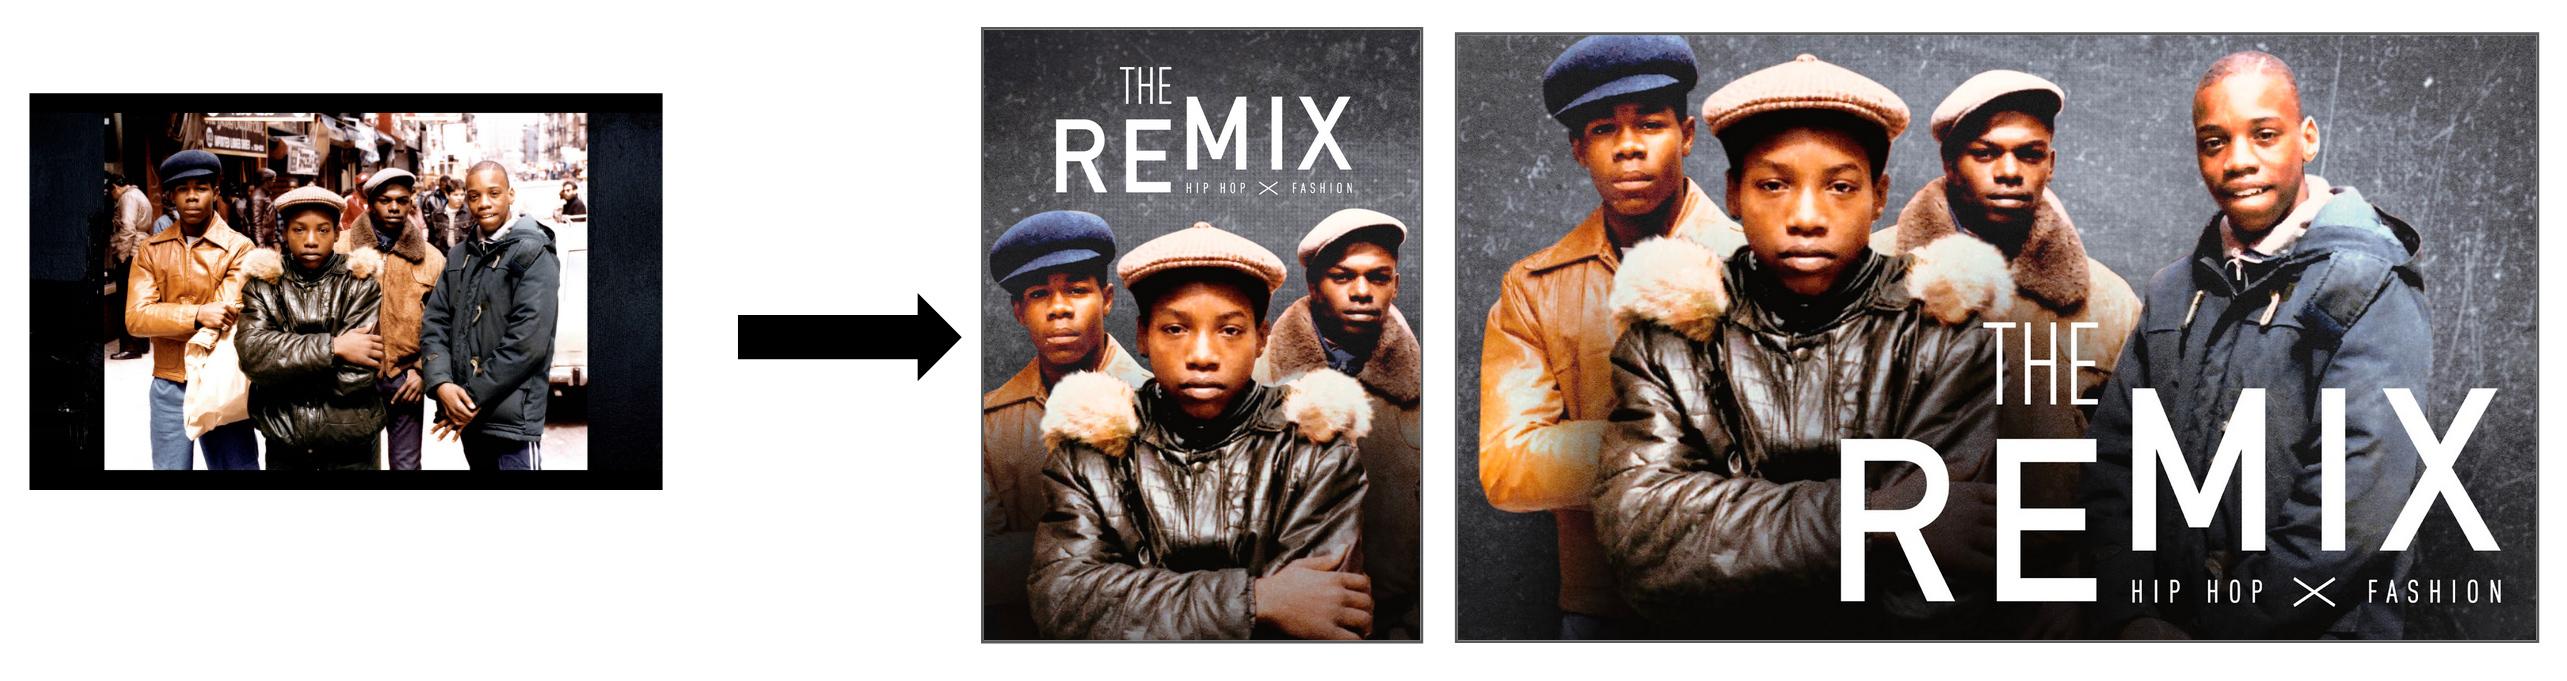 The Remix - Image turned into SDP & Boxshot